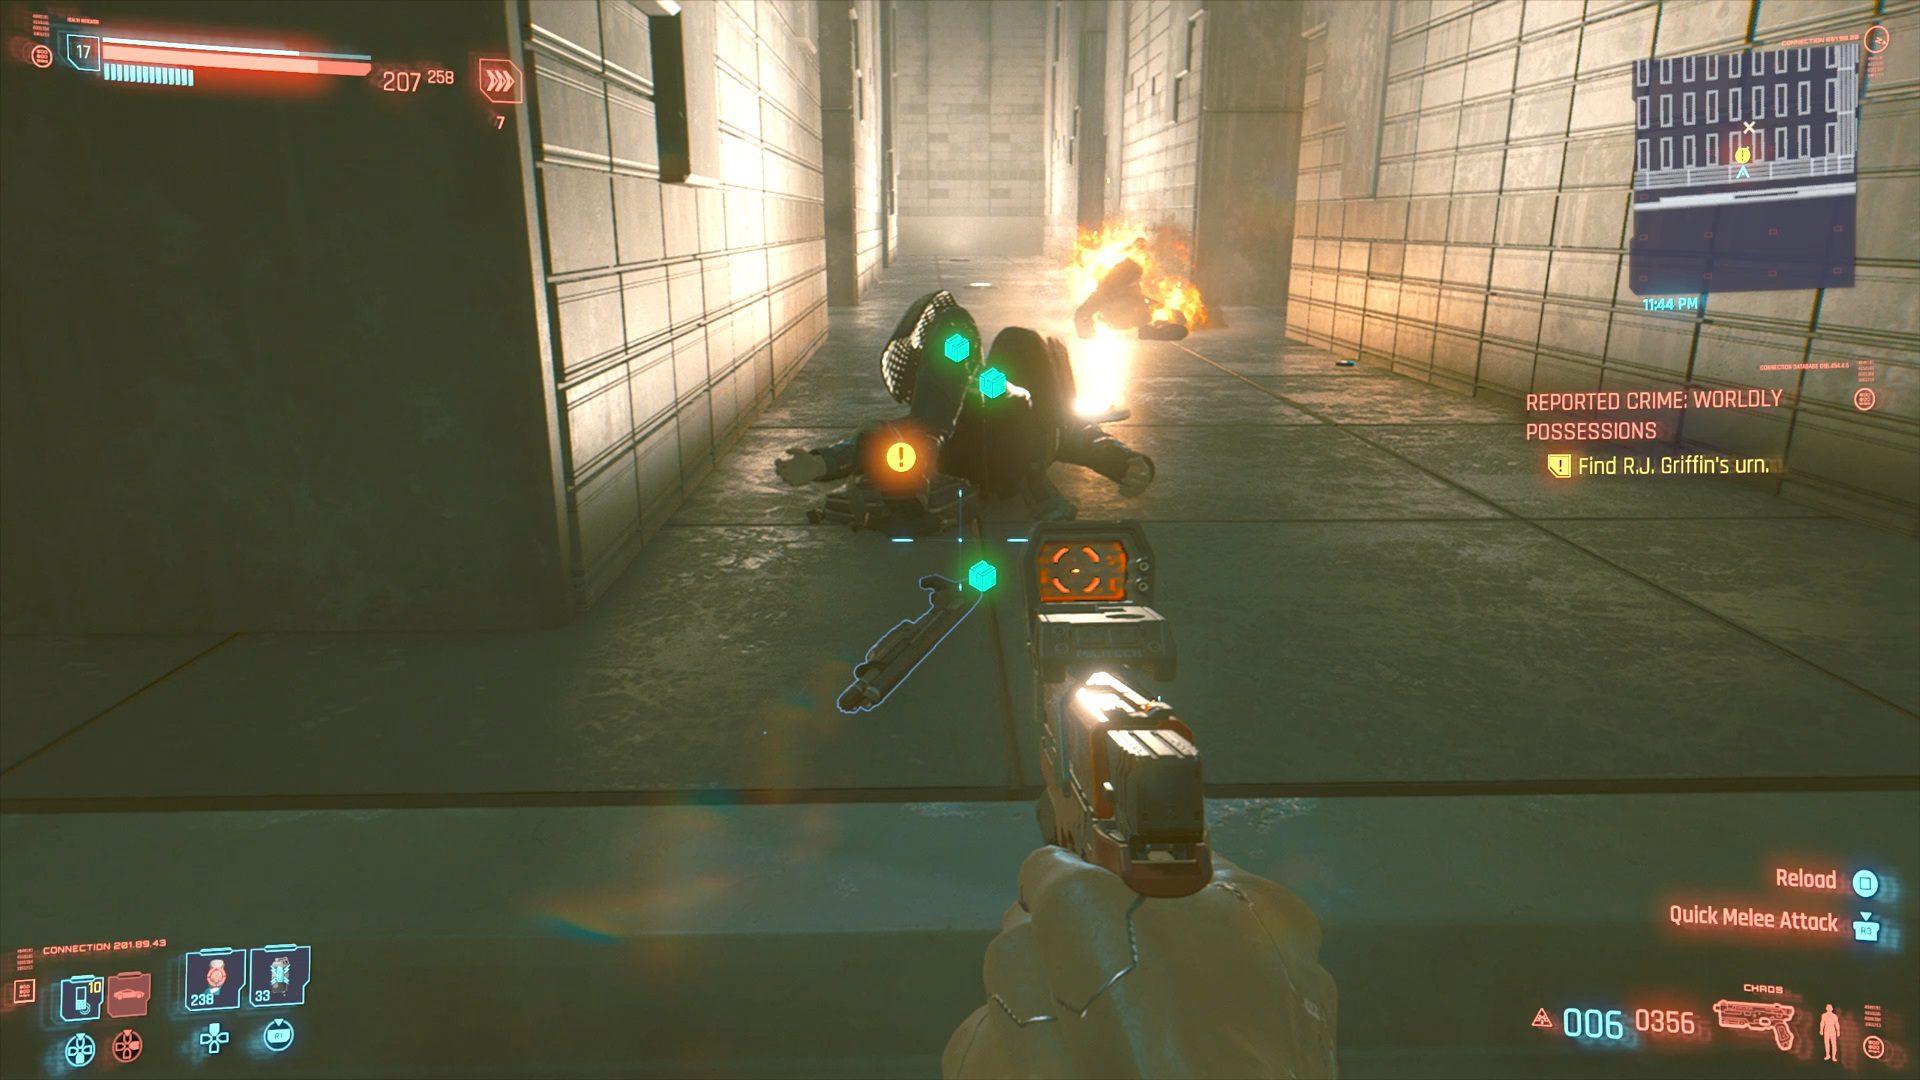 Cyberpunk 2077 R.J. Griffin's Urn Location